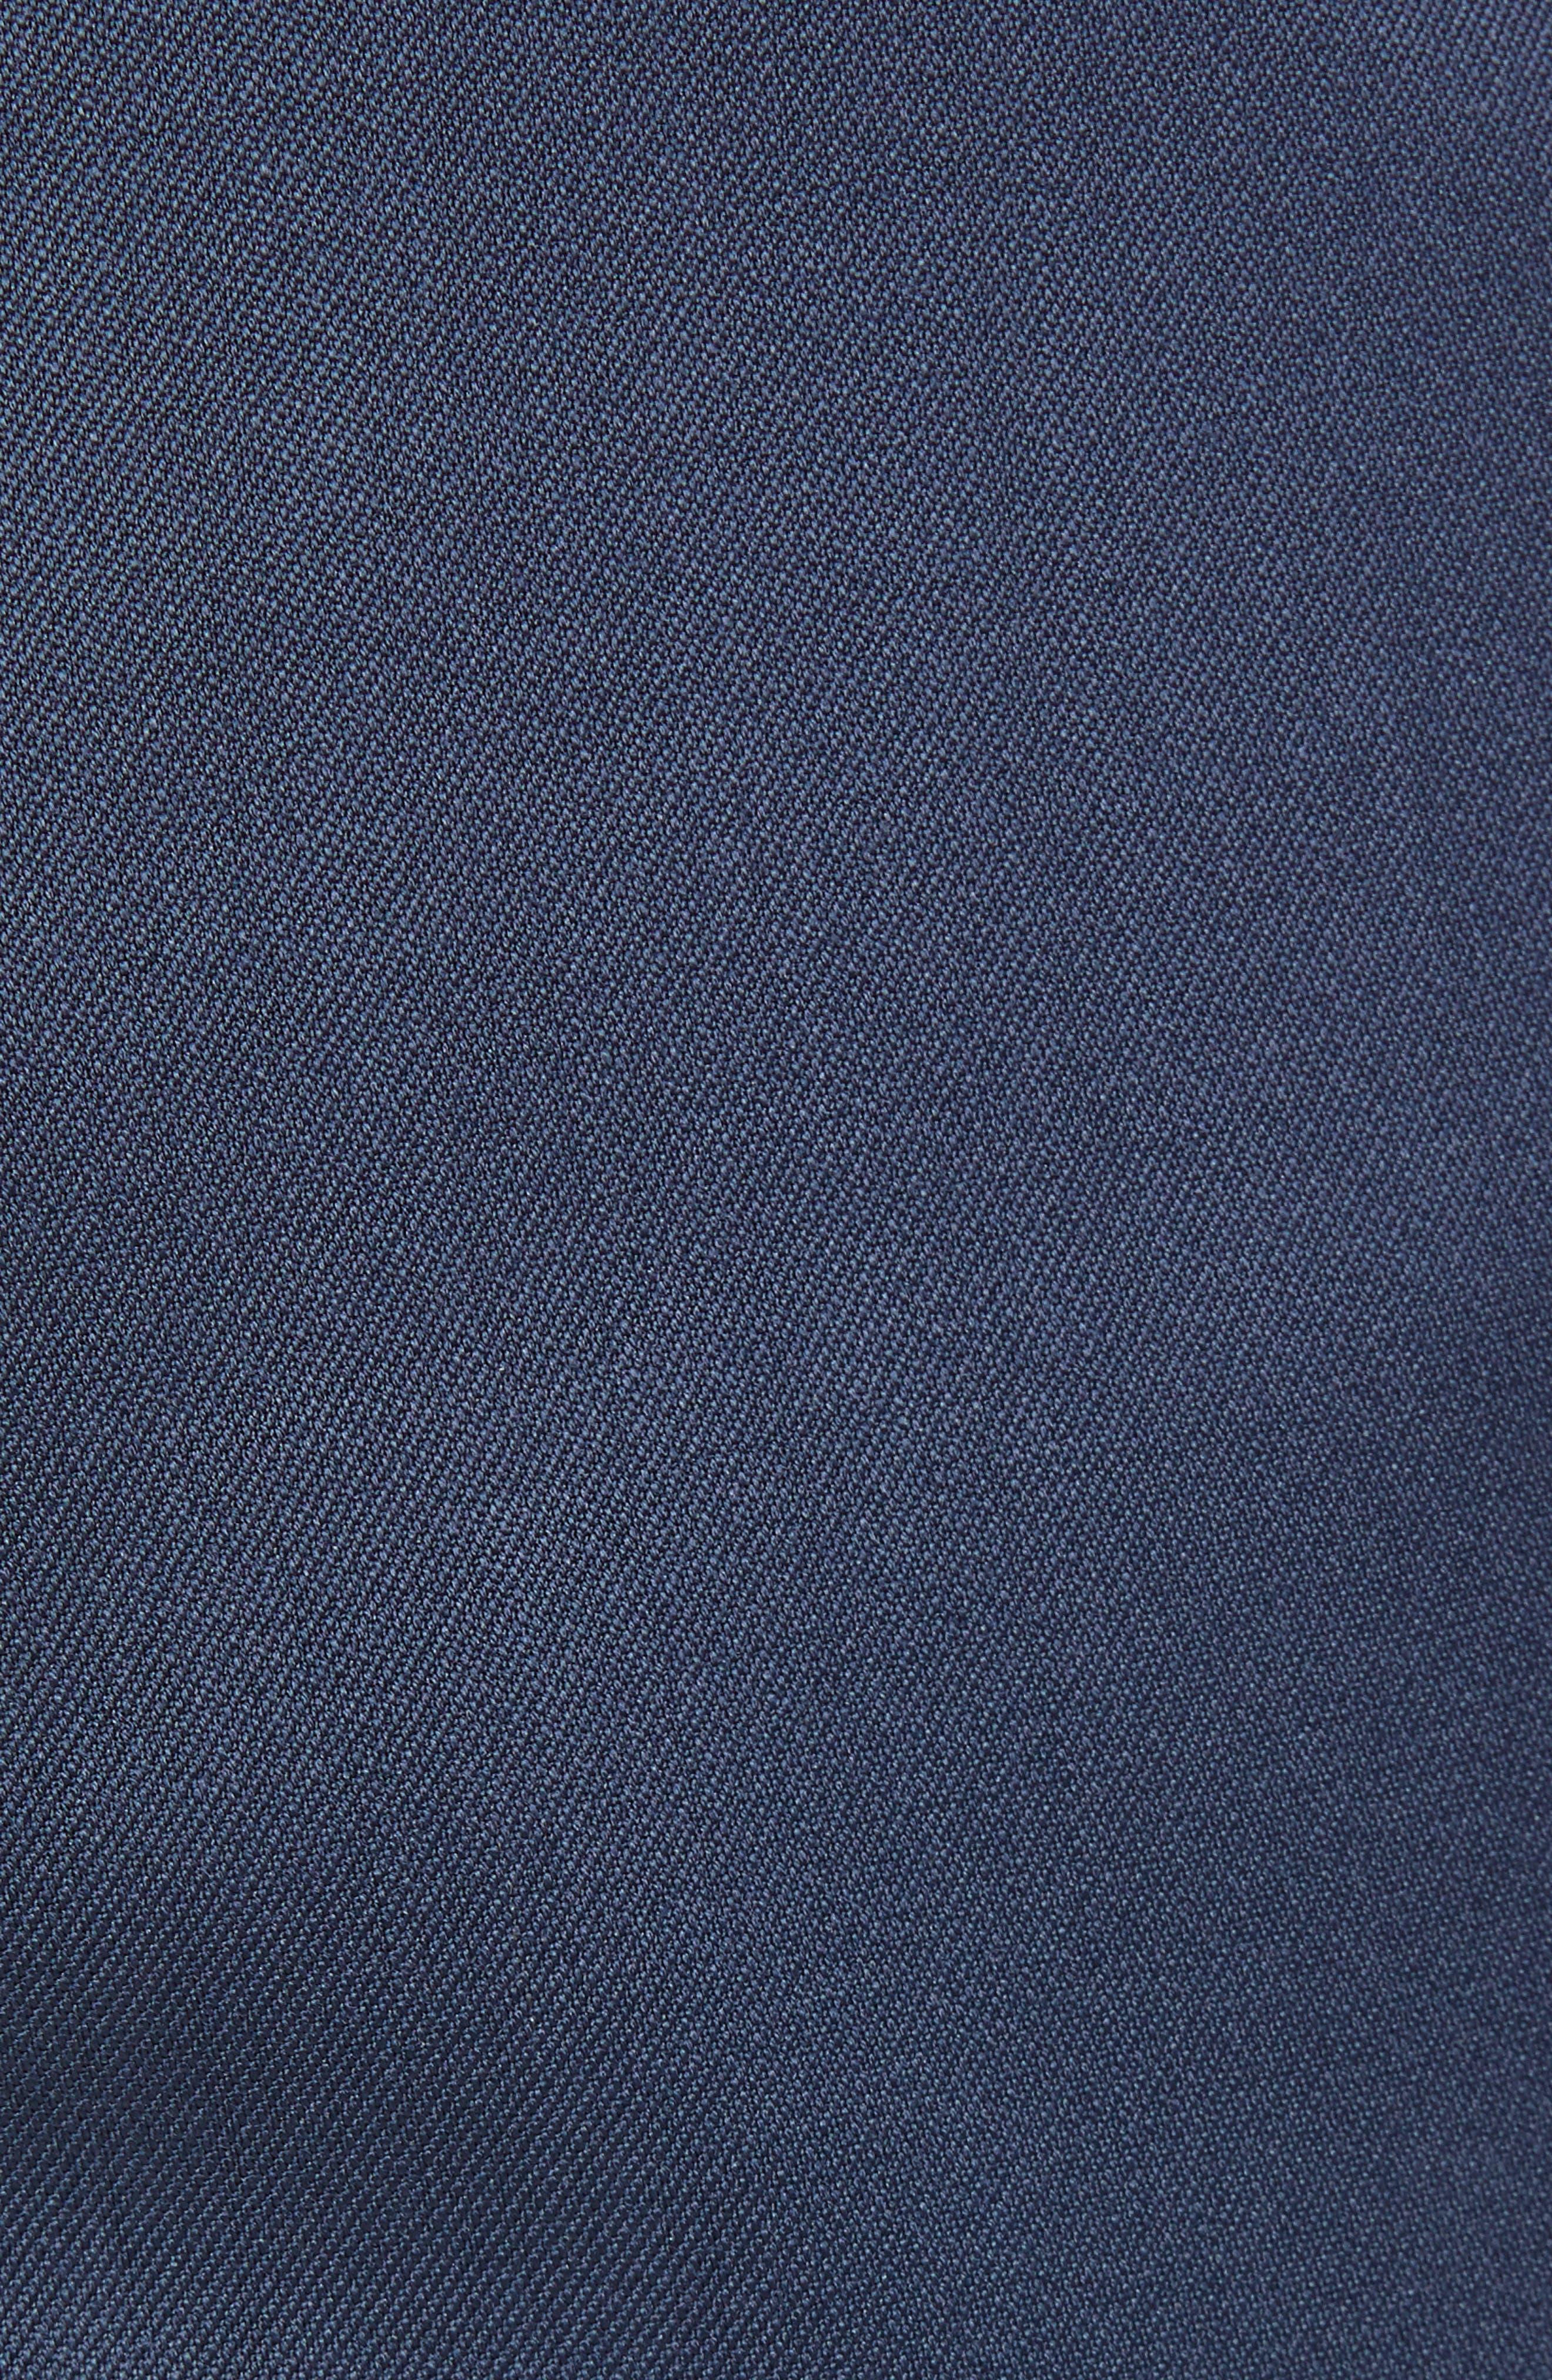 Torino Flat Front Wool Gabardine Trousers,                             Alternate thumbnail 30, color,